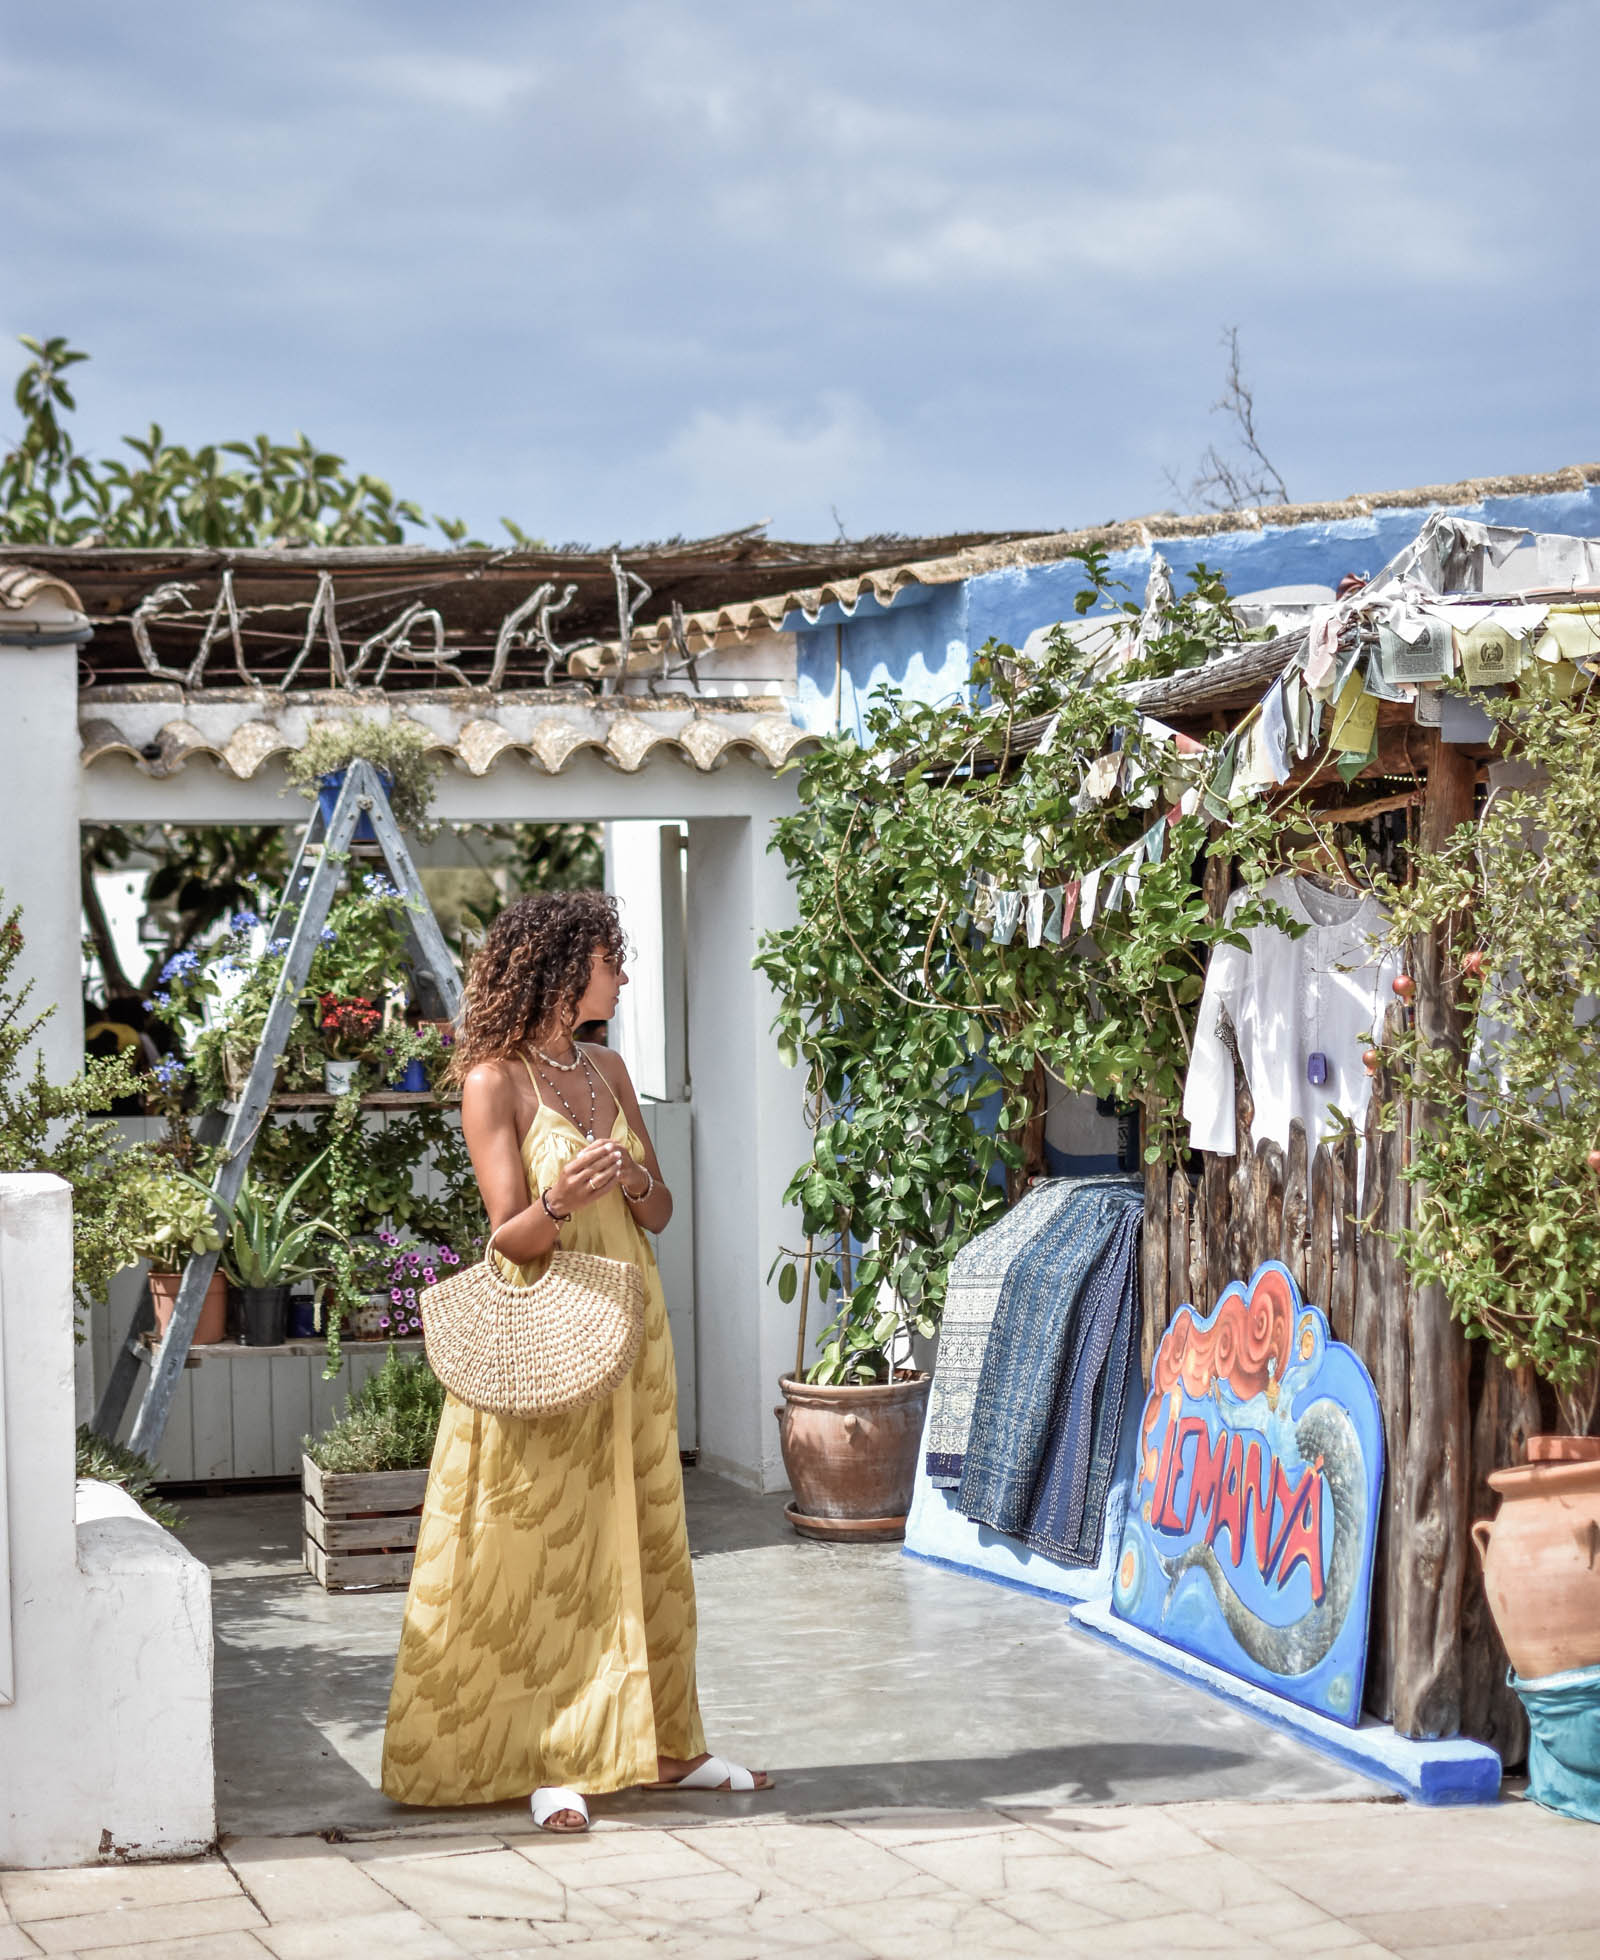 el-blog-de-silvia-rodriguez-street-style-wedding-dress-devota-y-lomba-bulgari-bag-masario-tocado-blogger-boda-otoño-manolo-blahnik